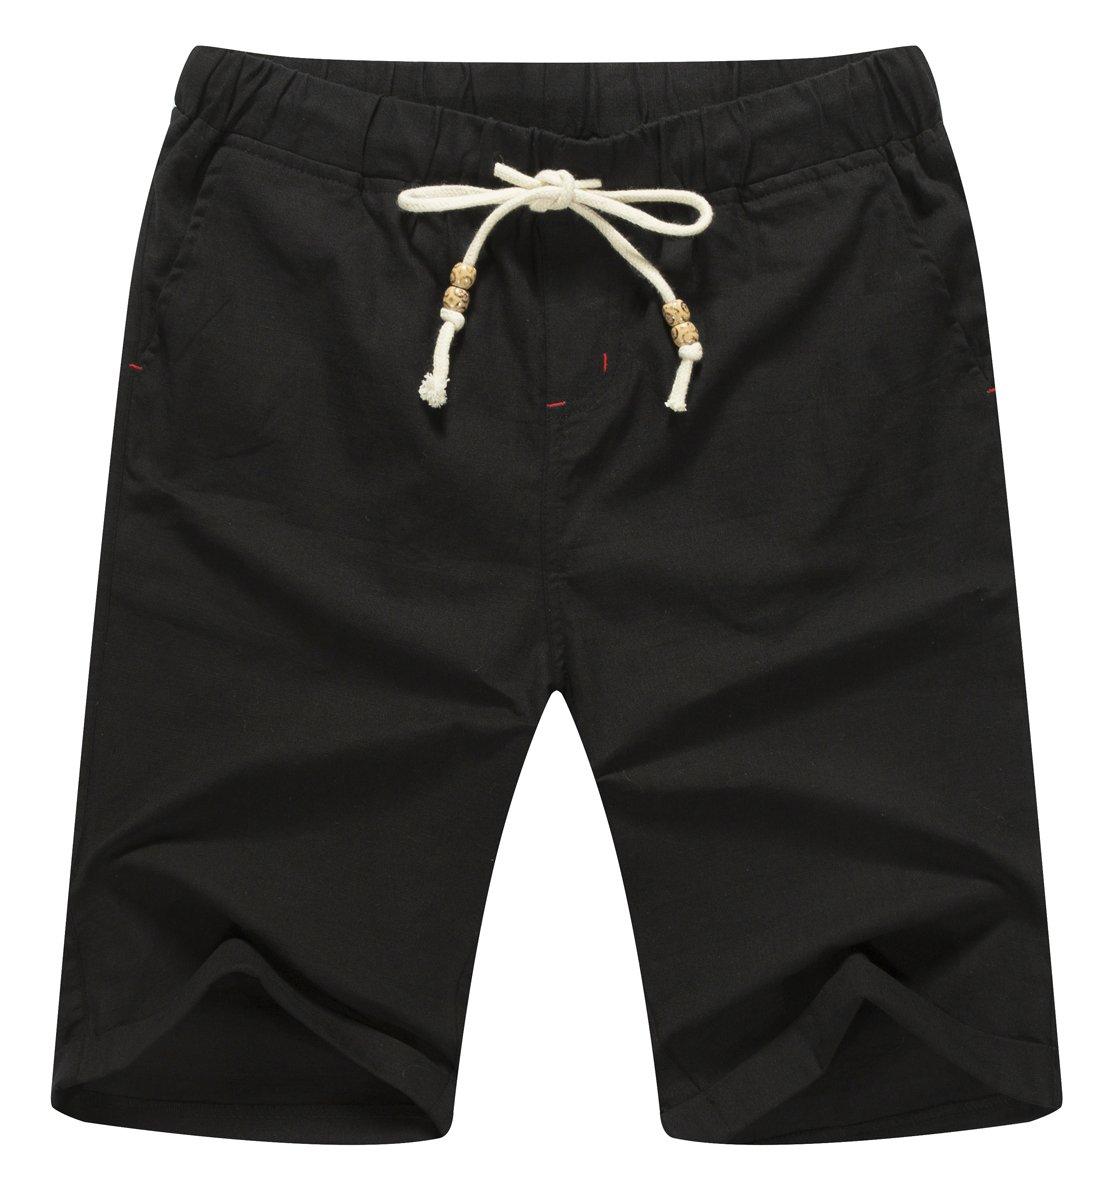 ZYFMAILY Men's Linen Casual Classic Fit Short Drawstring Summer Beach Shorts (XL, Black)